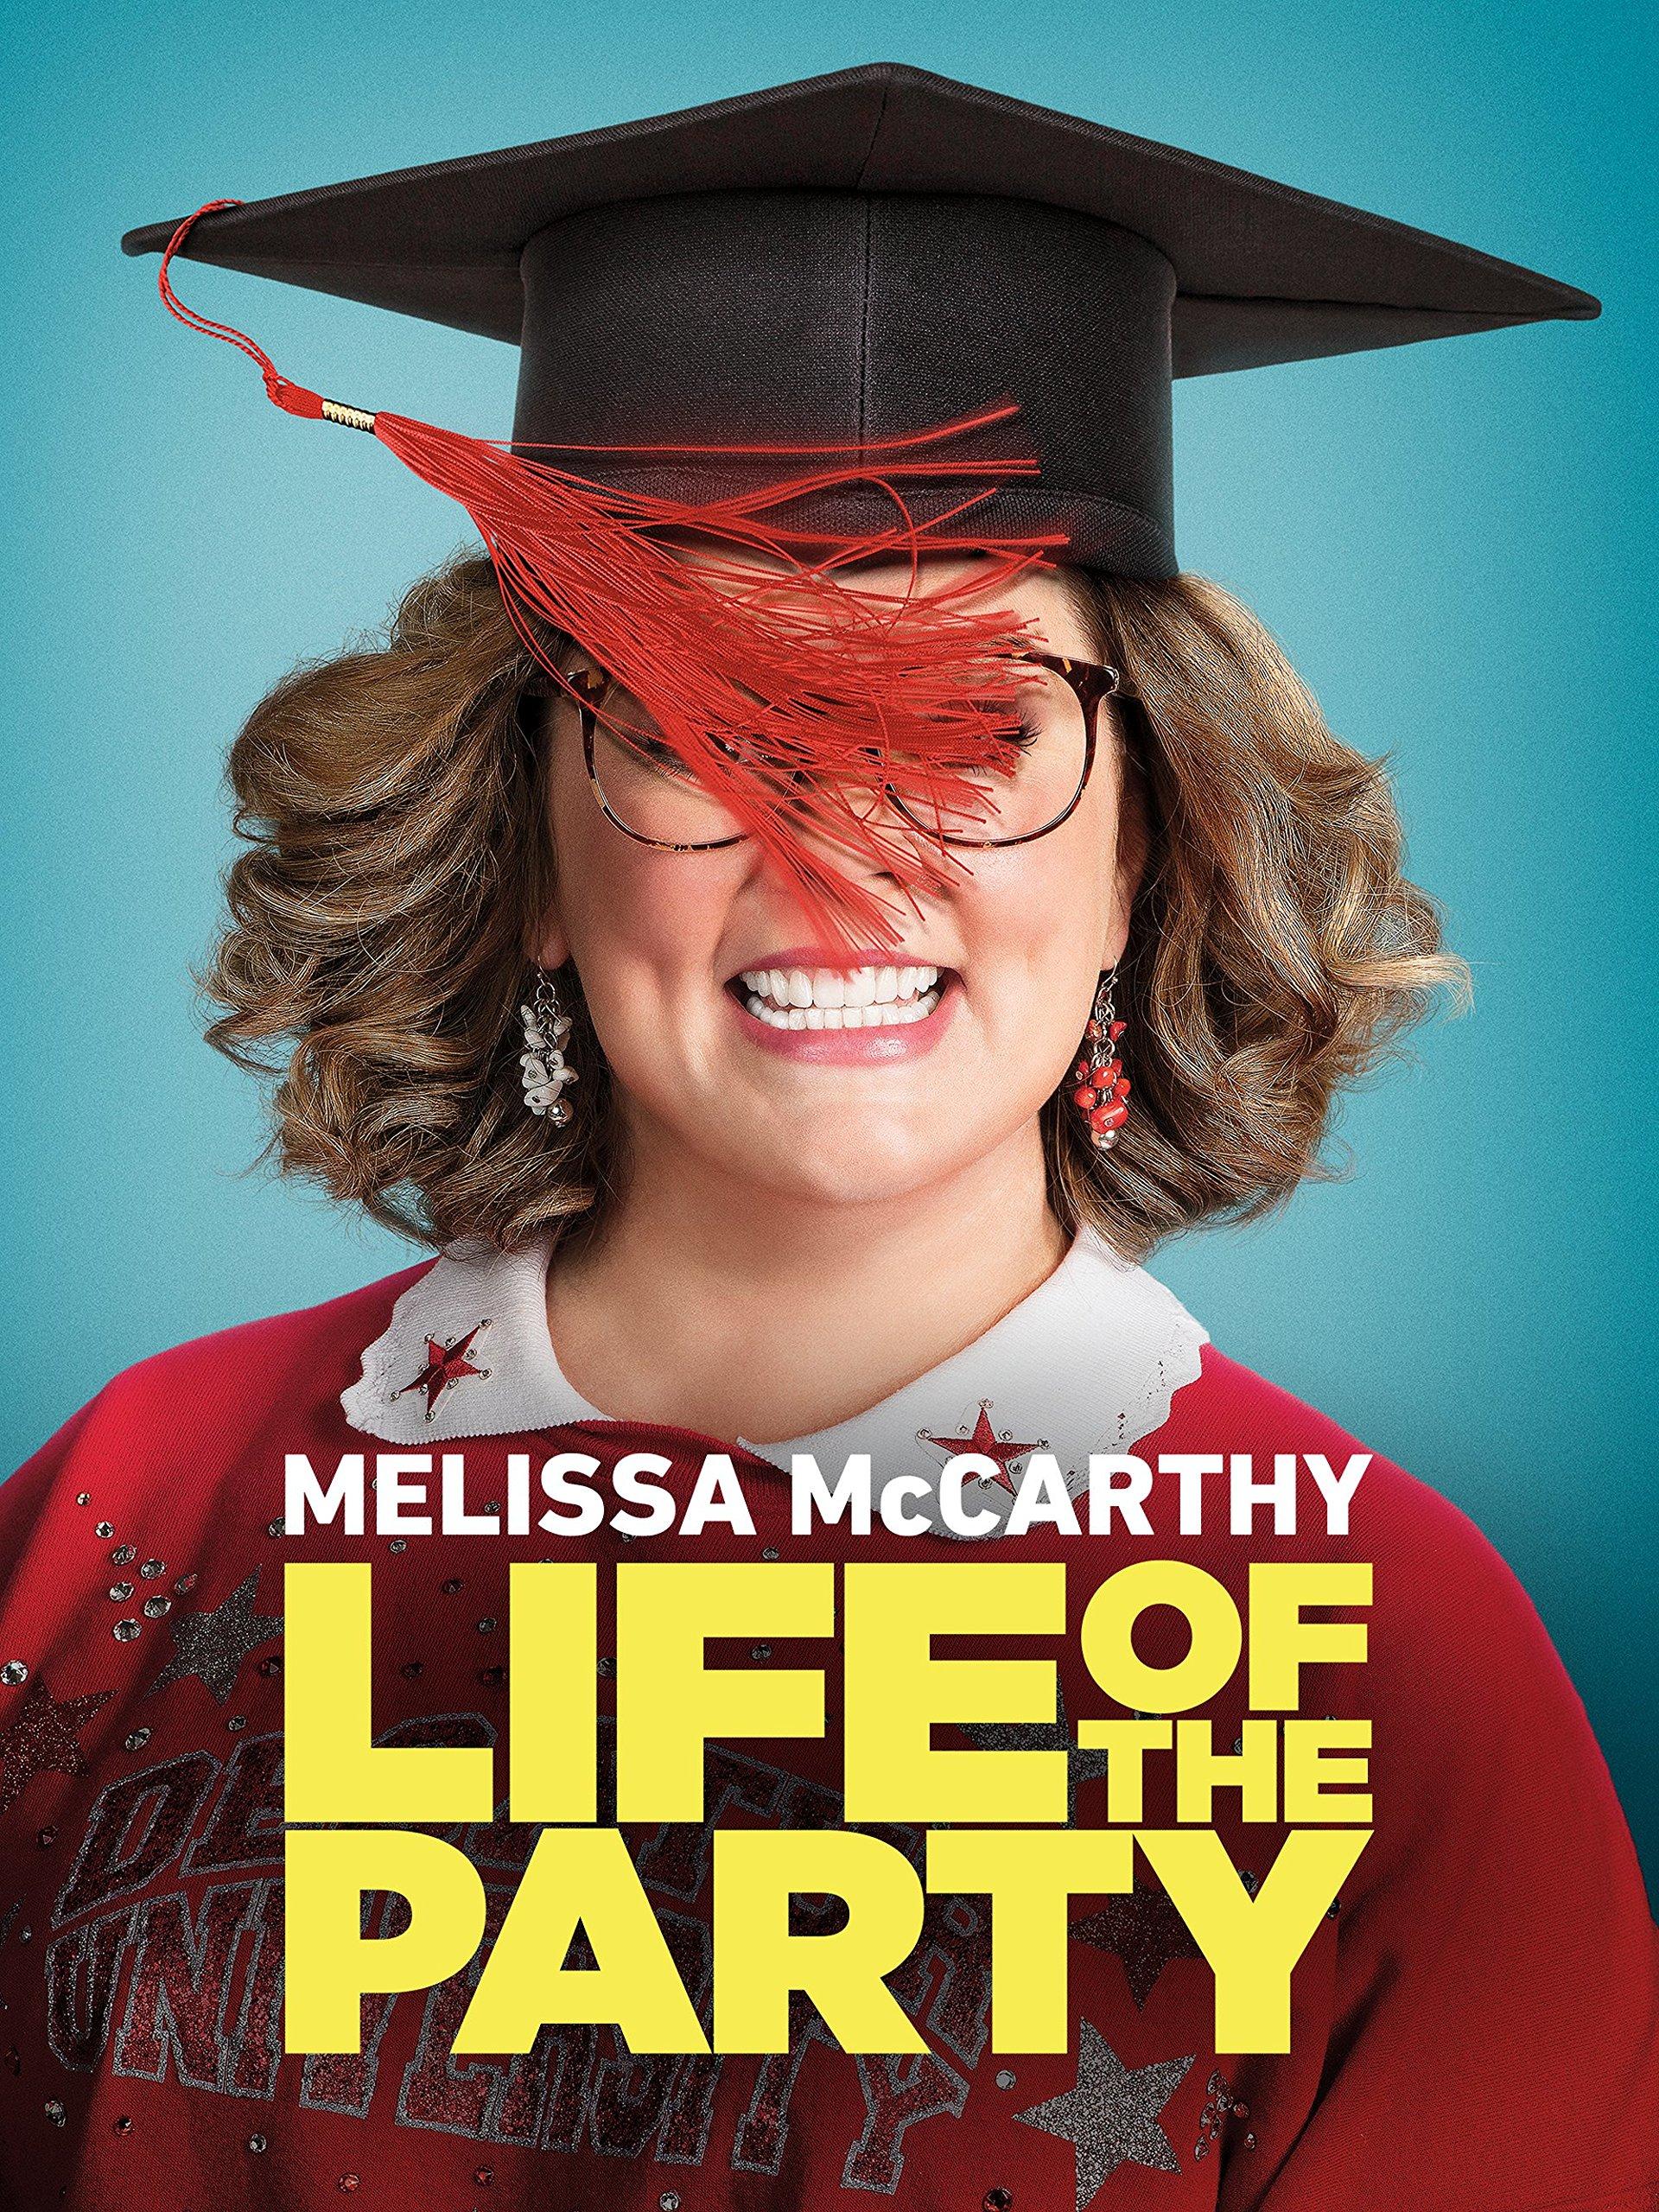 Amazon.com: Life Of The Party: Melissa McCarthy, Gillian ...